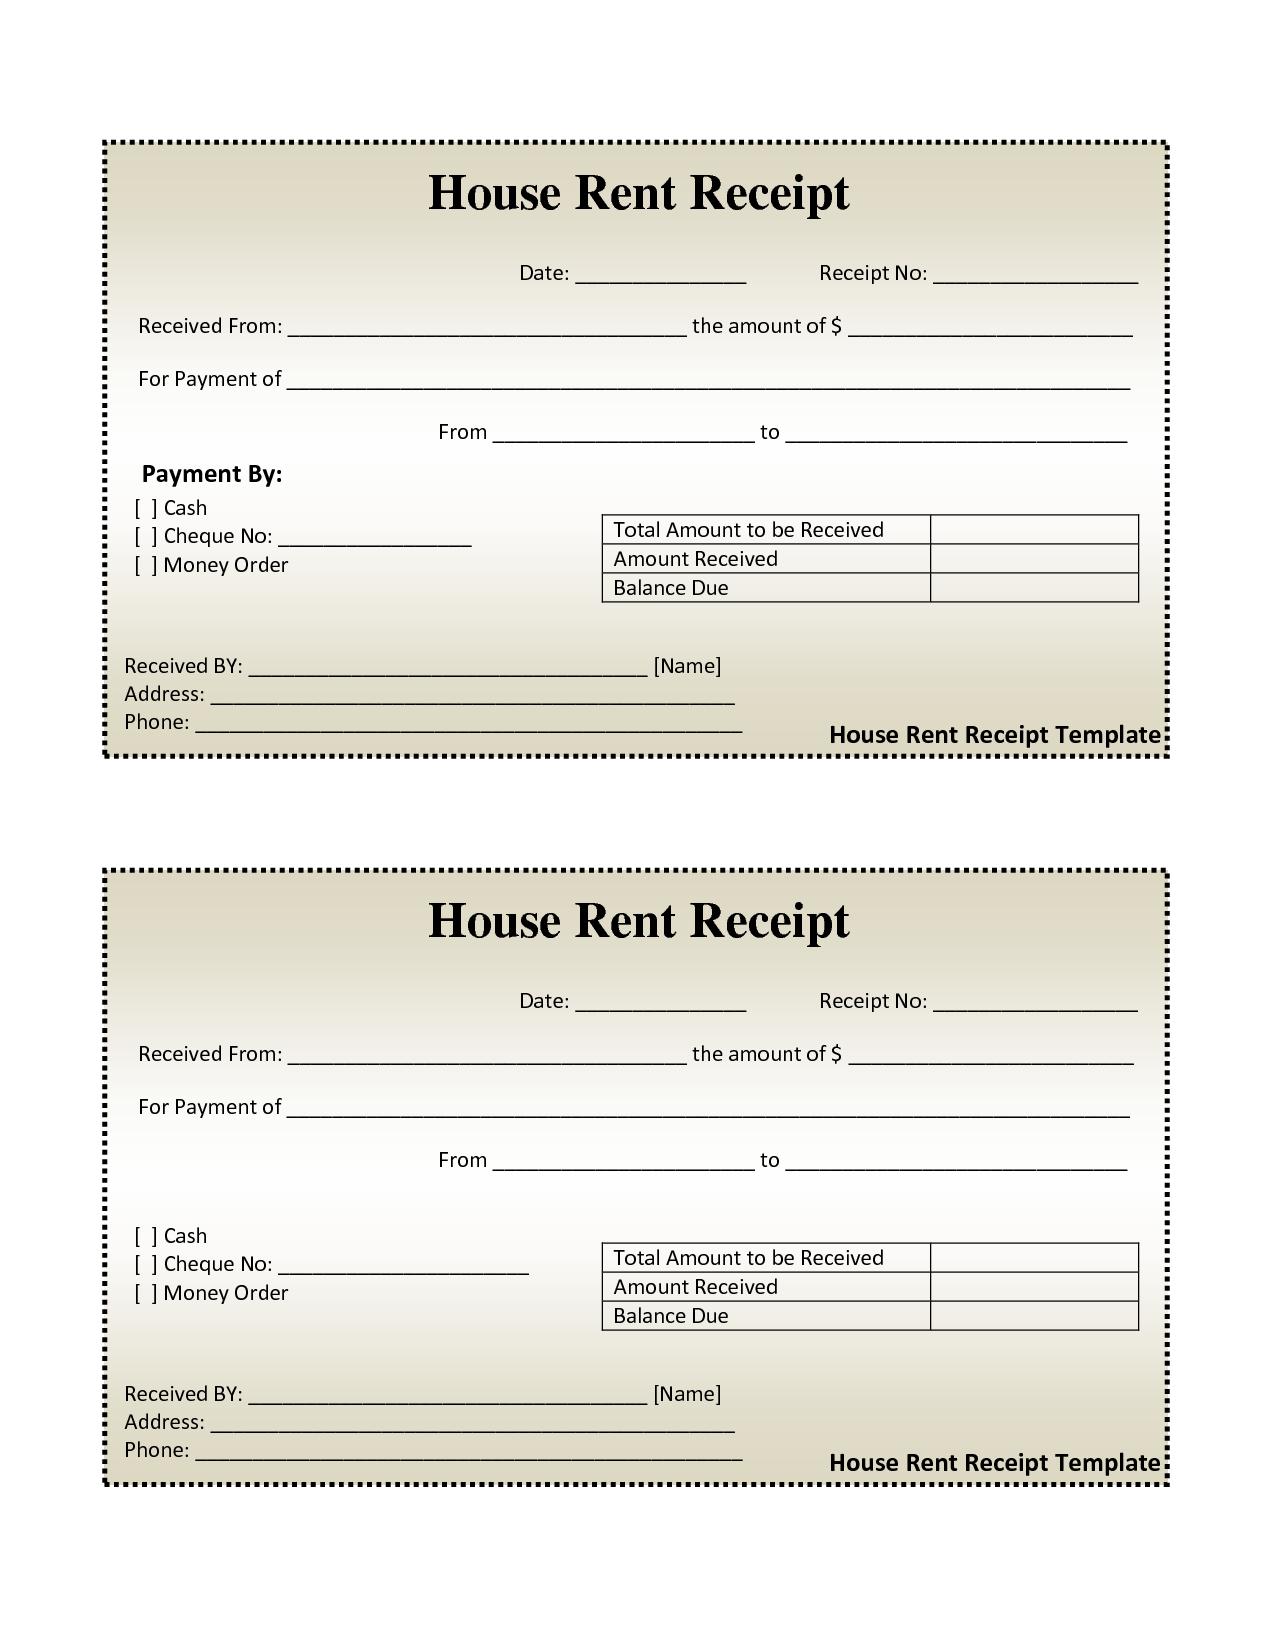 Unique Rent Billing Xls Xlsformat Xlstemplates Xlstemplate Check More At Https Mavensocial Co Ren Receipt Template Free Receipt Template Invoice Template